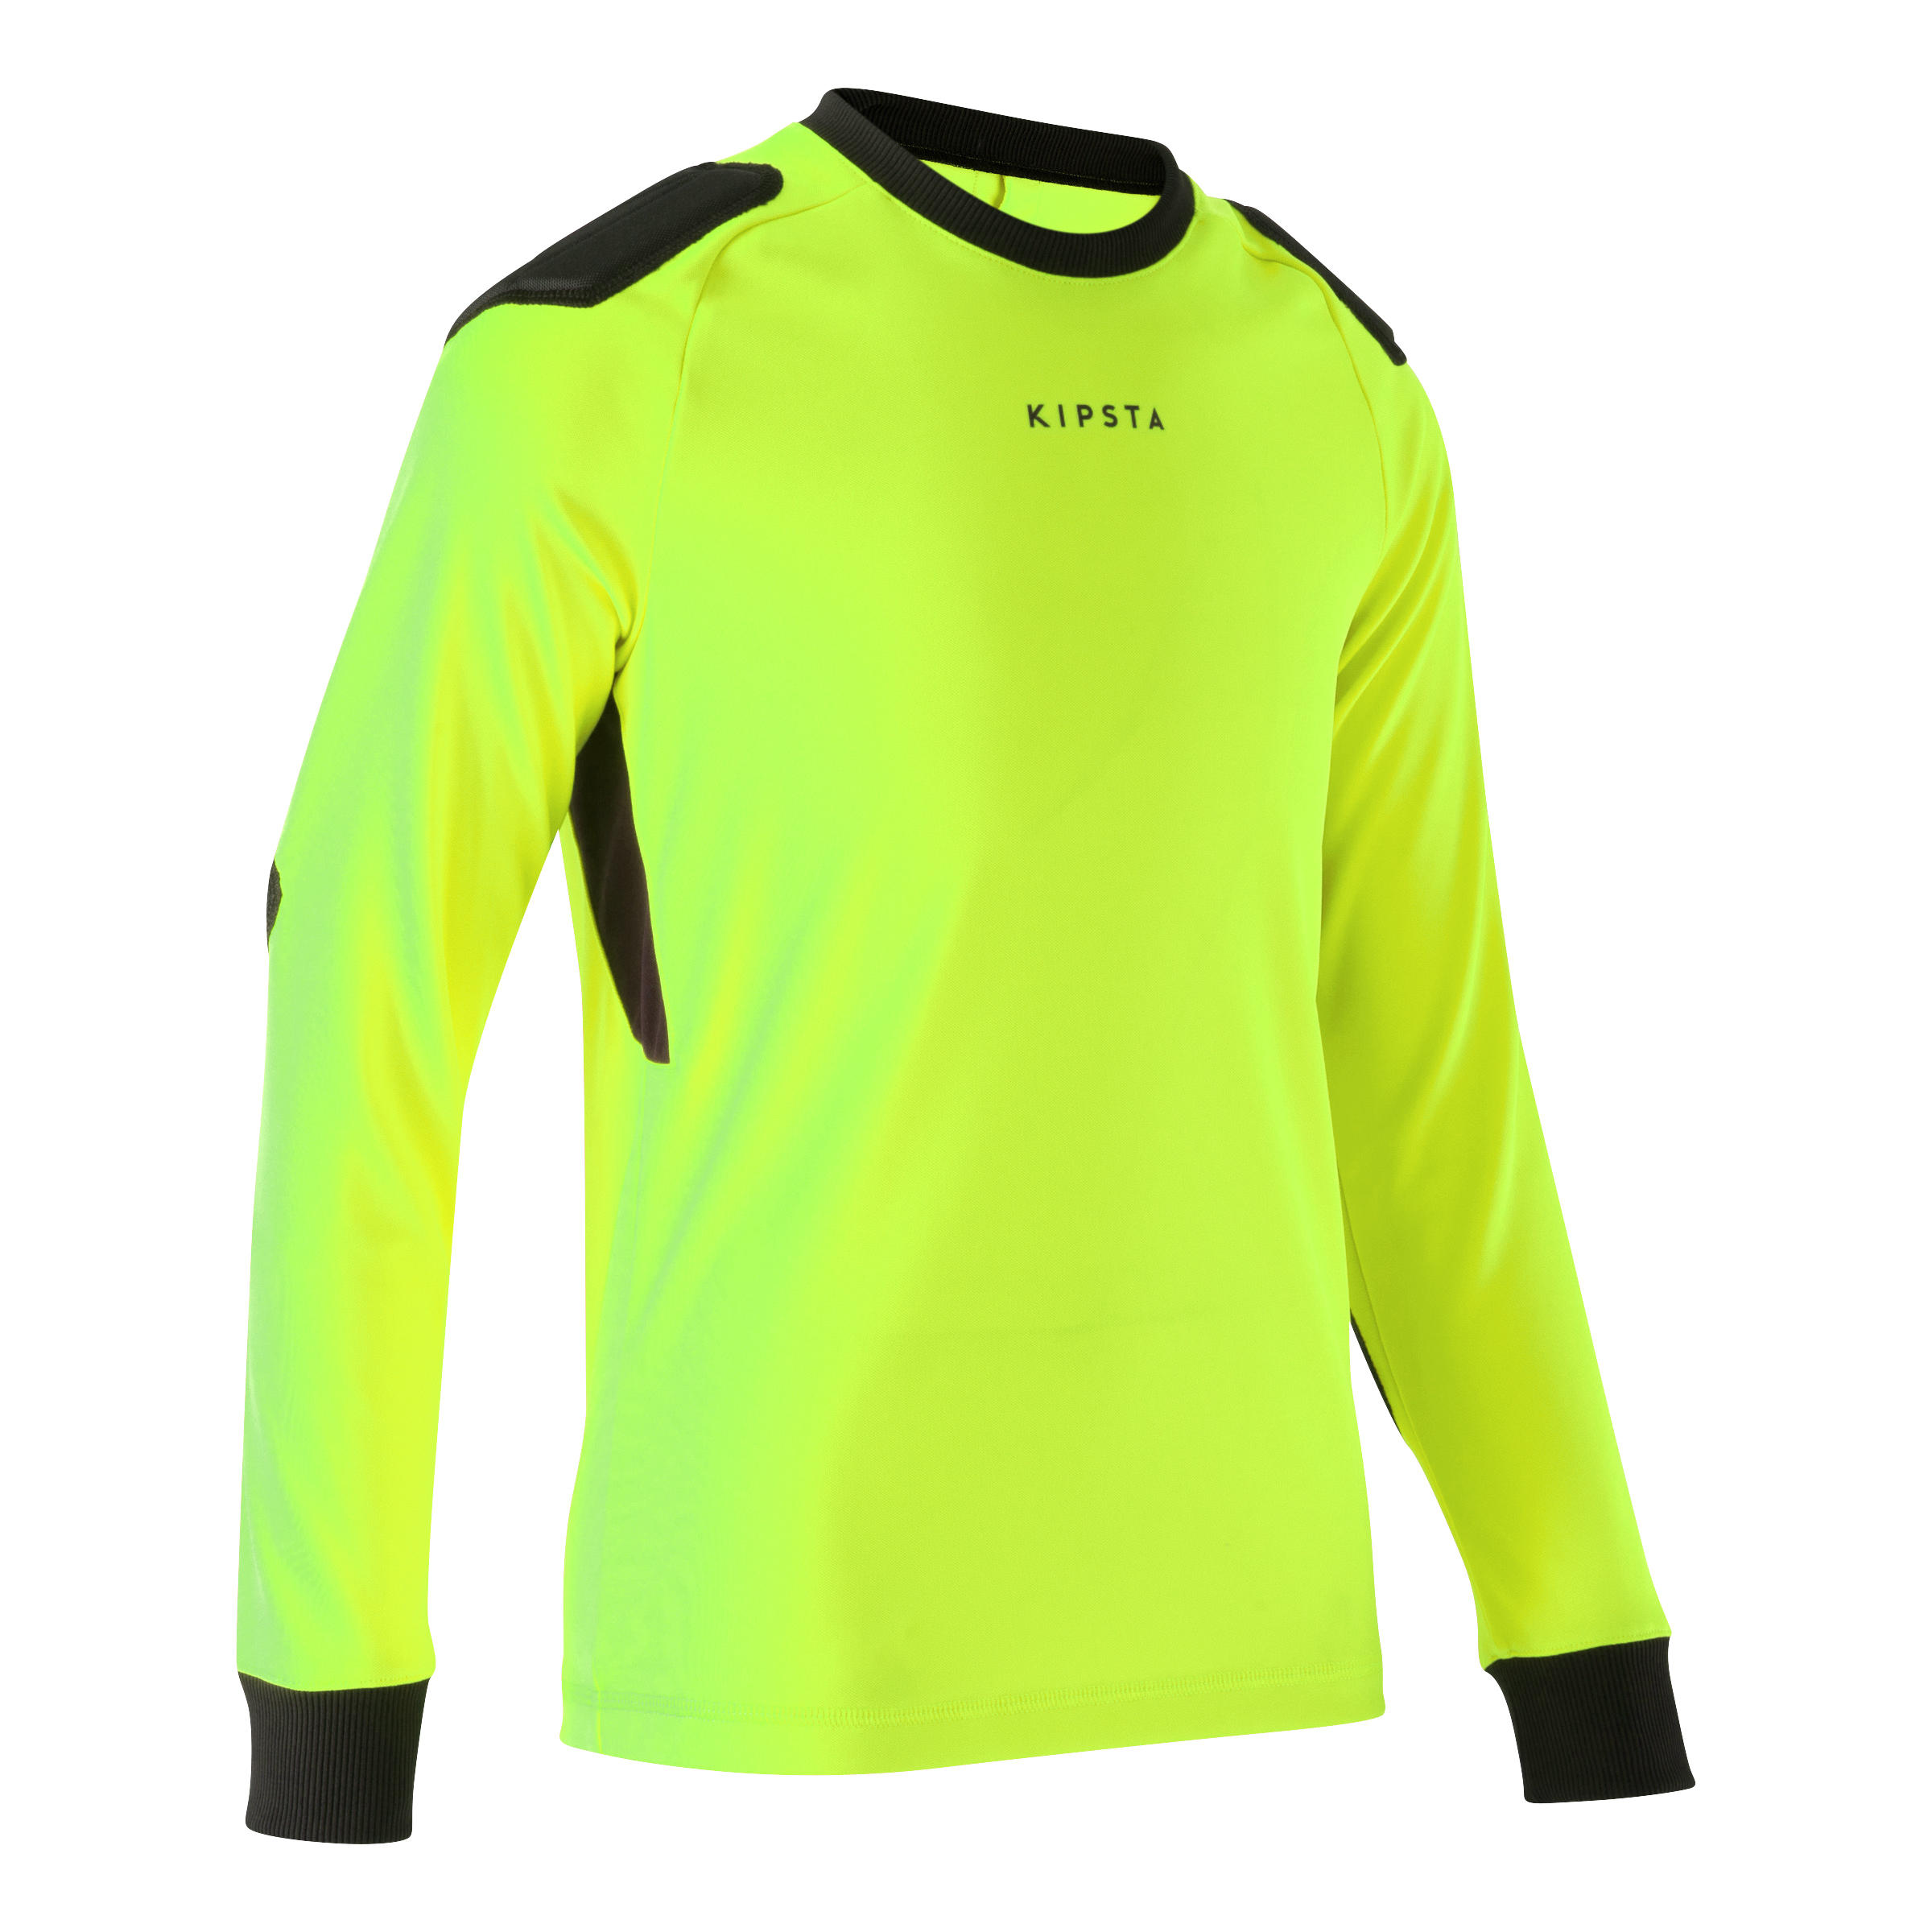 Camiseta de portero F100 júnior amarillo